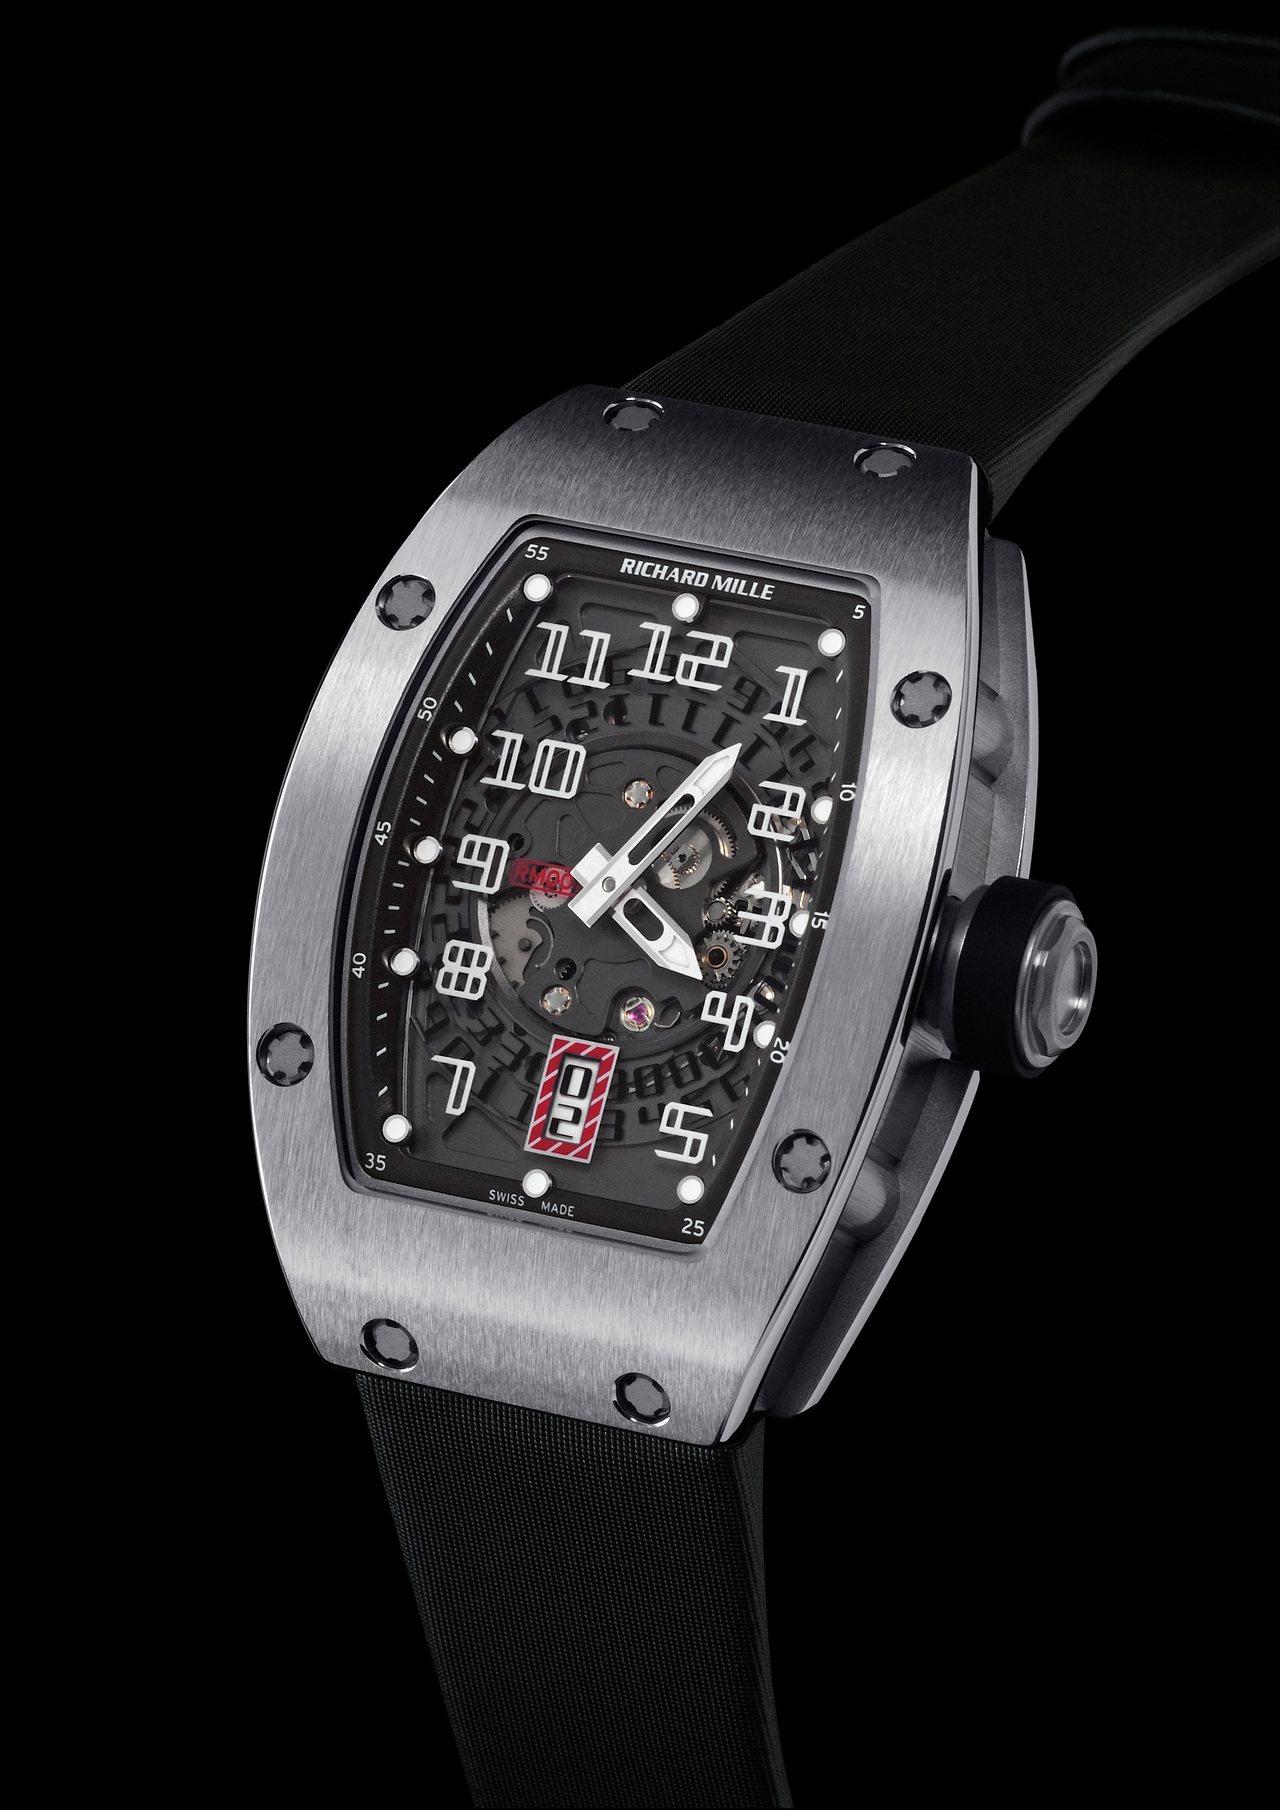 RICHARD MILLE RM 007鈦合金腕表,鈦合金表殼搭配鉑金表冠,動力...